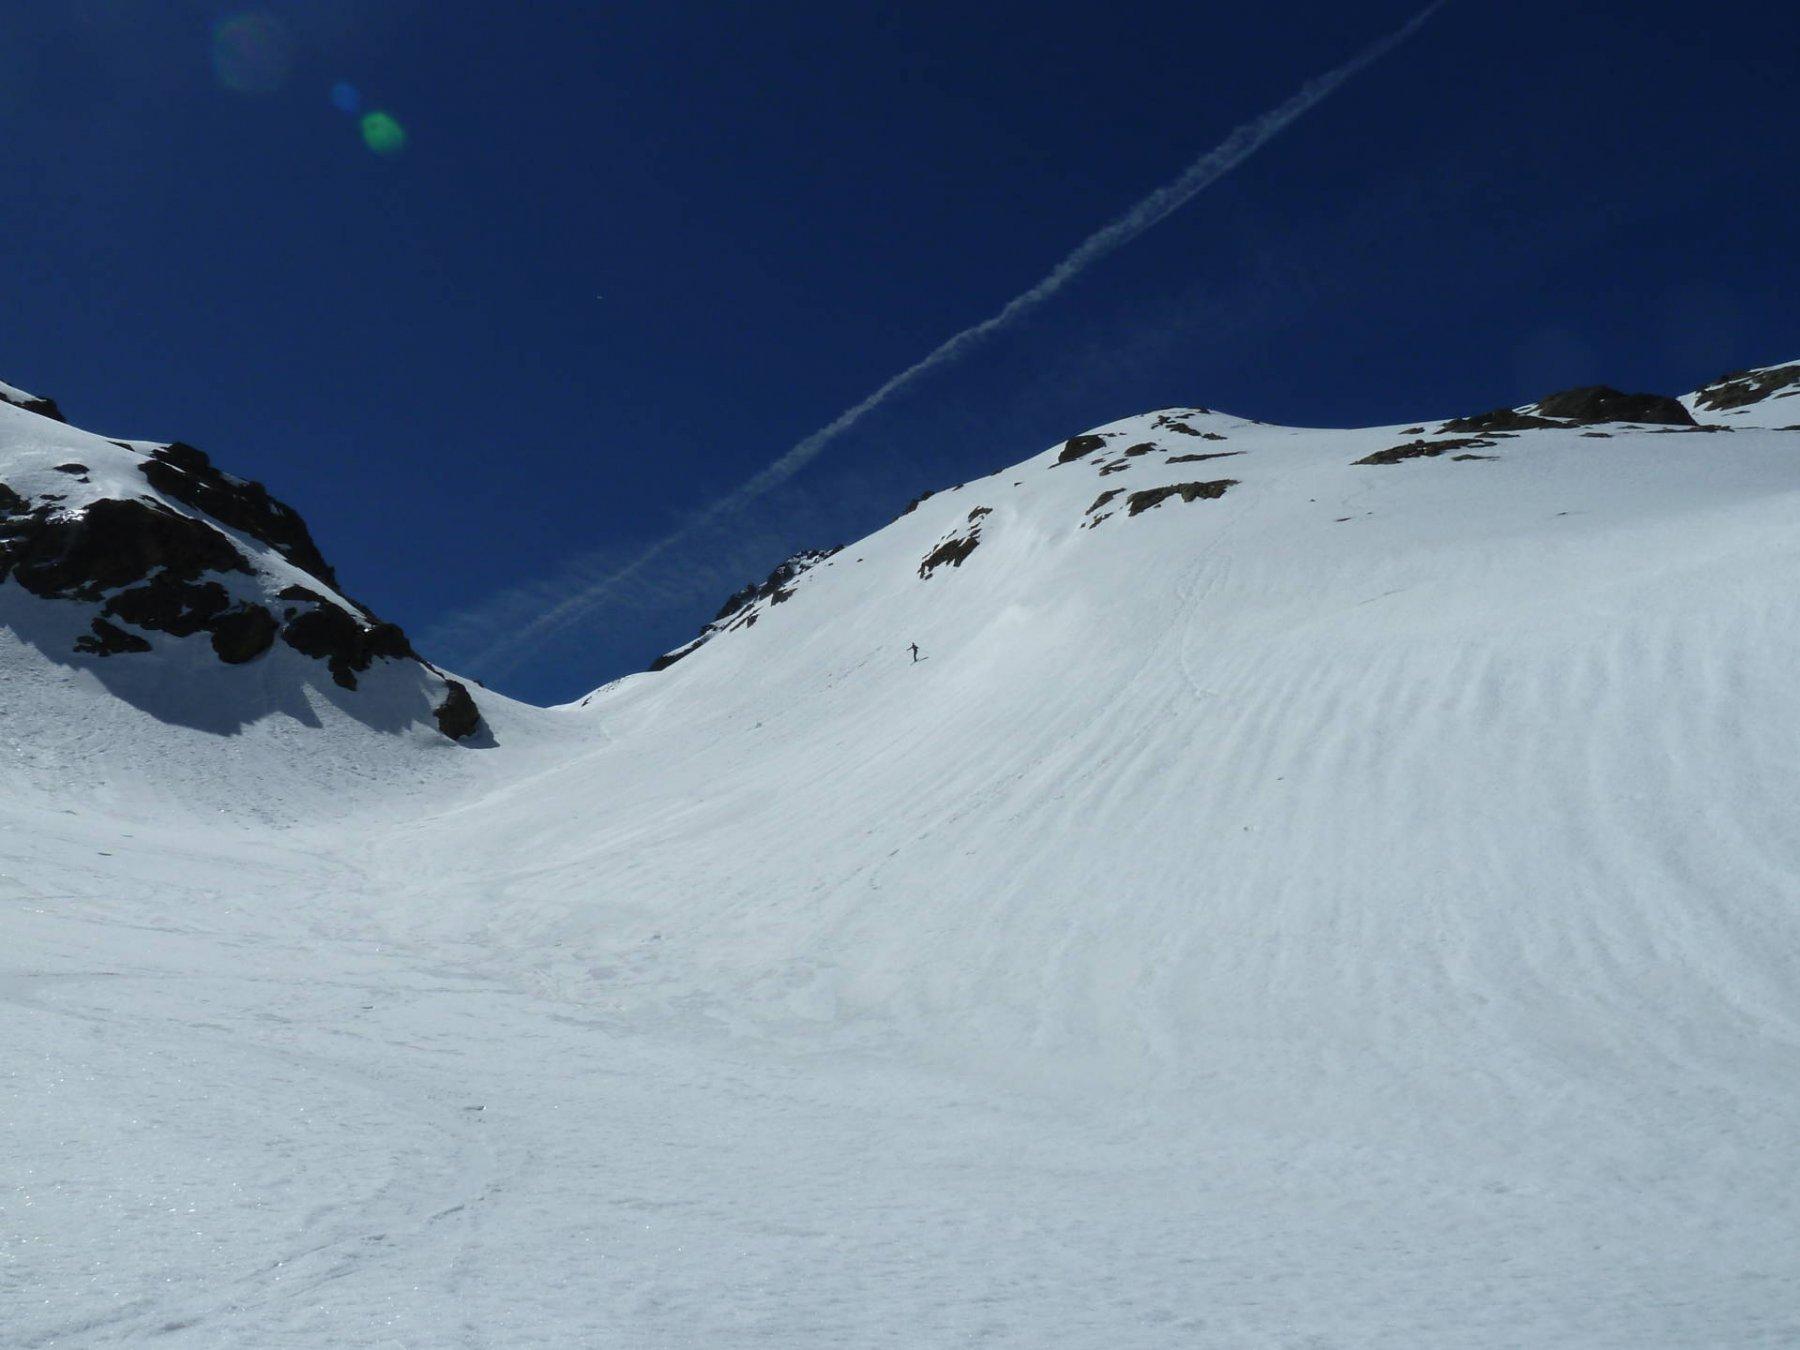 Pochi passaggi e neve fantastica